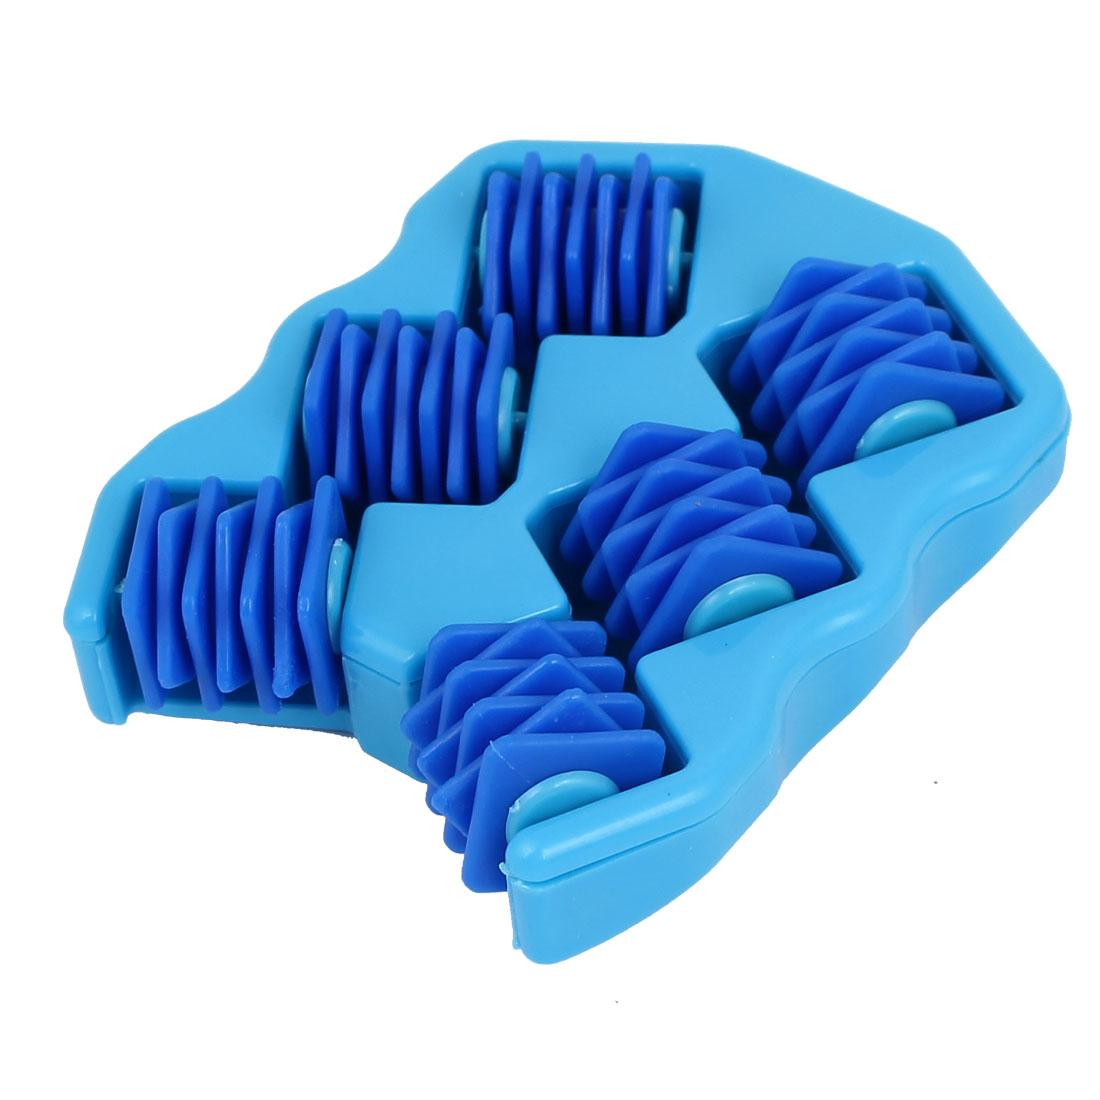 Plastic Shell 6 Wheel Stress Relief Body Relaxing Massage Roller Massager Blue